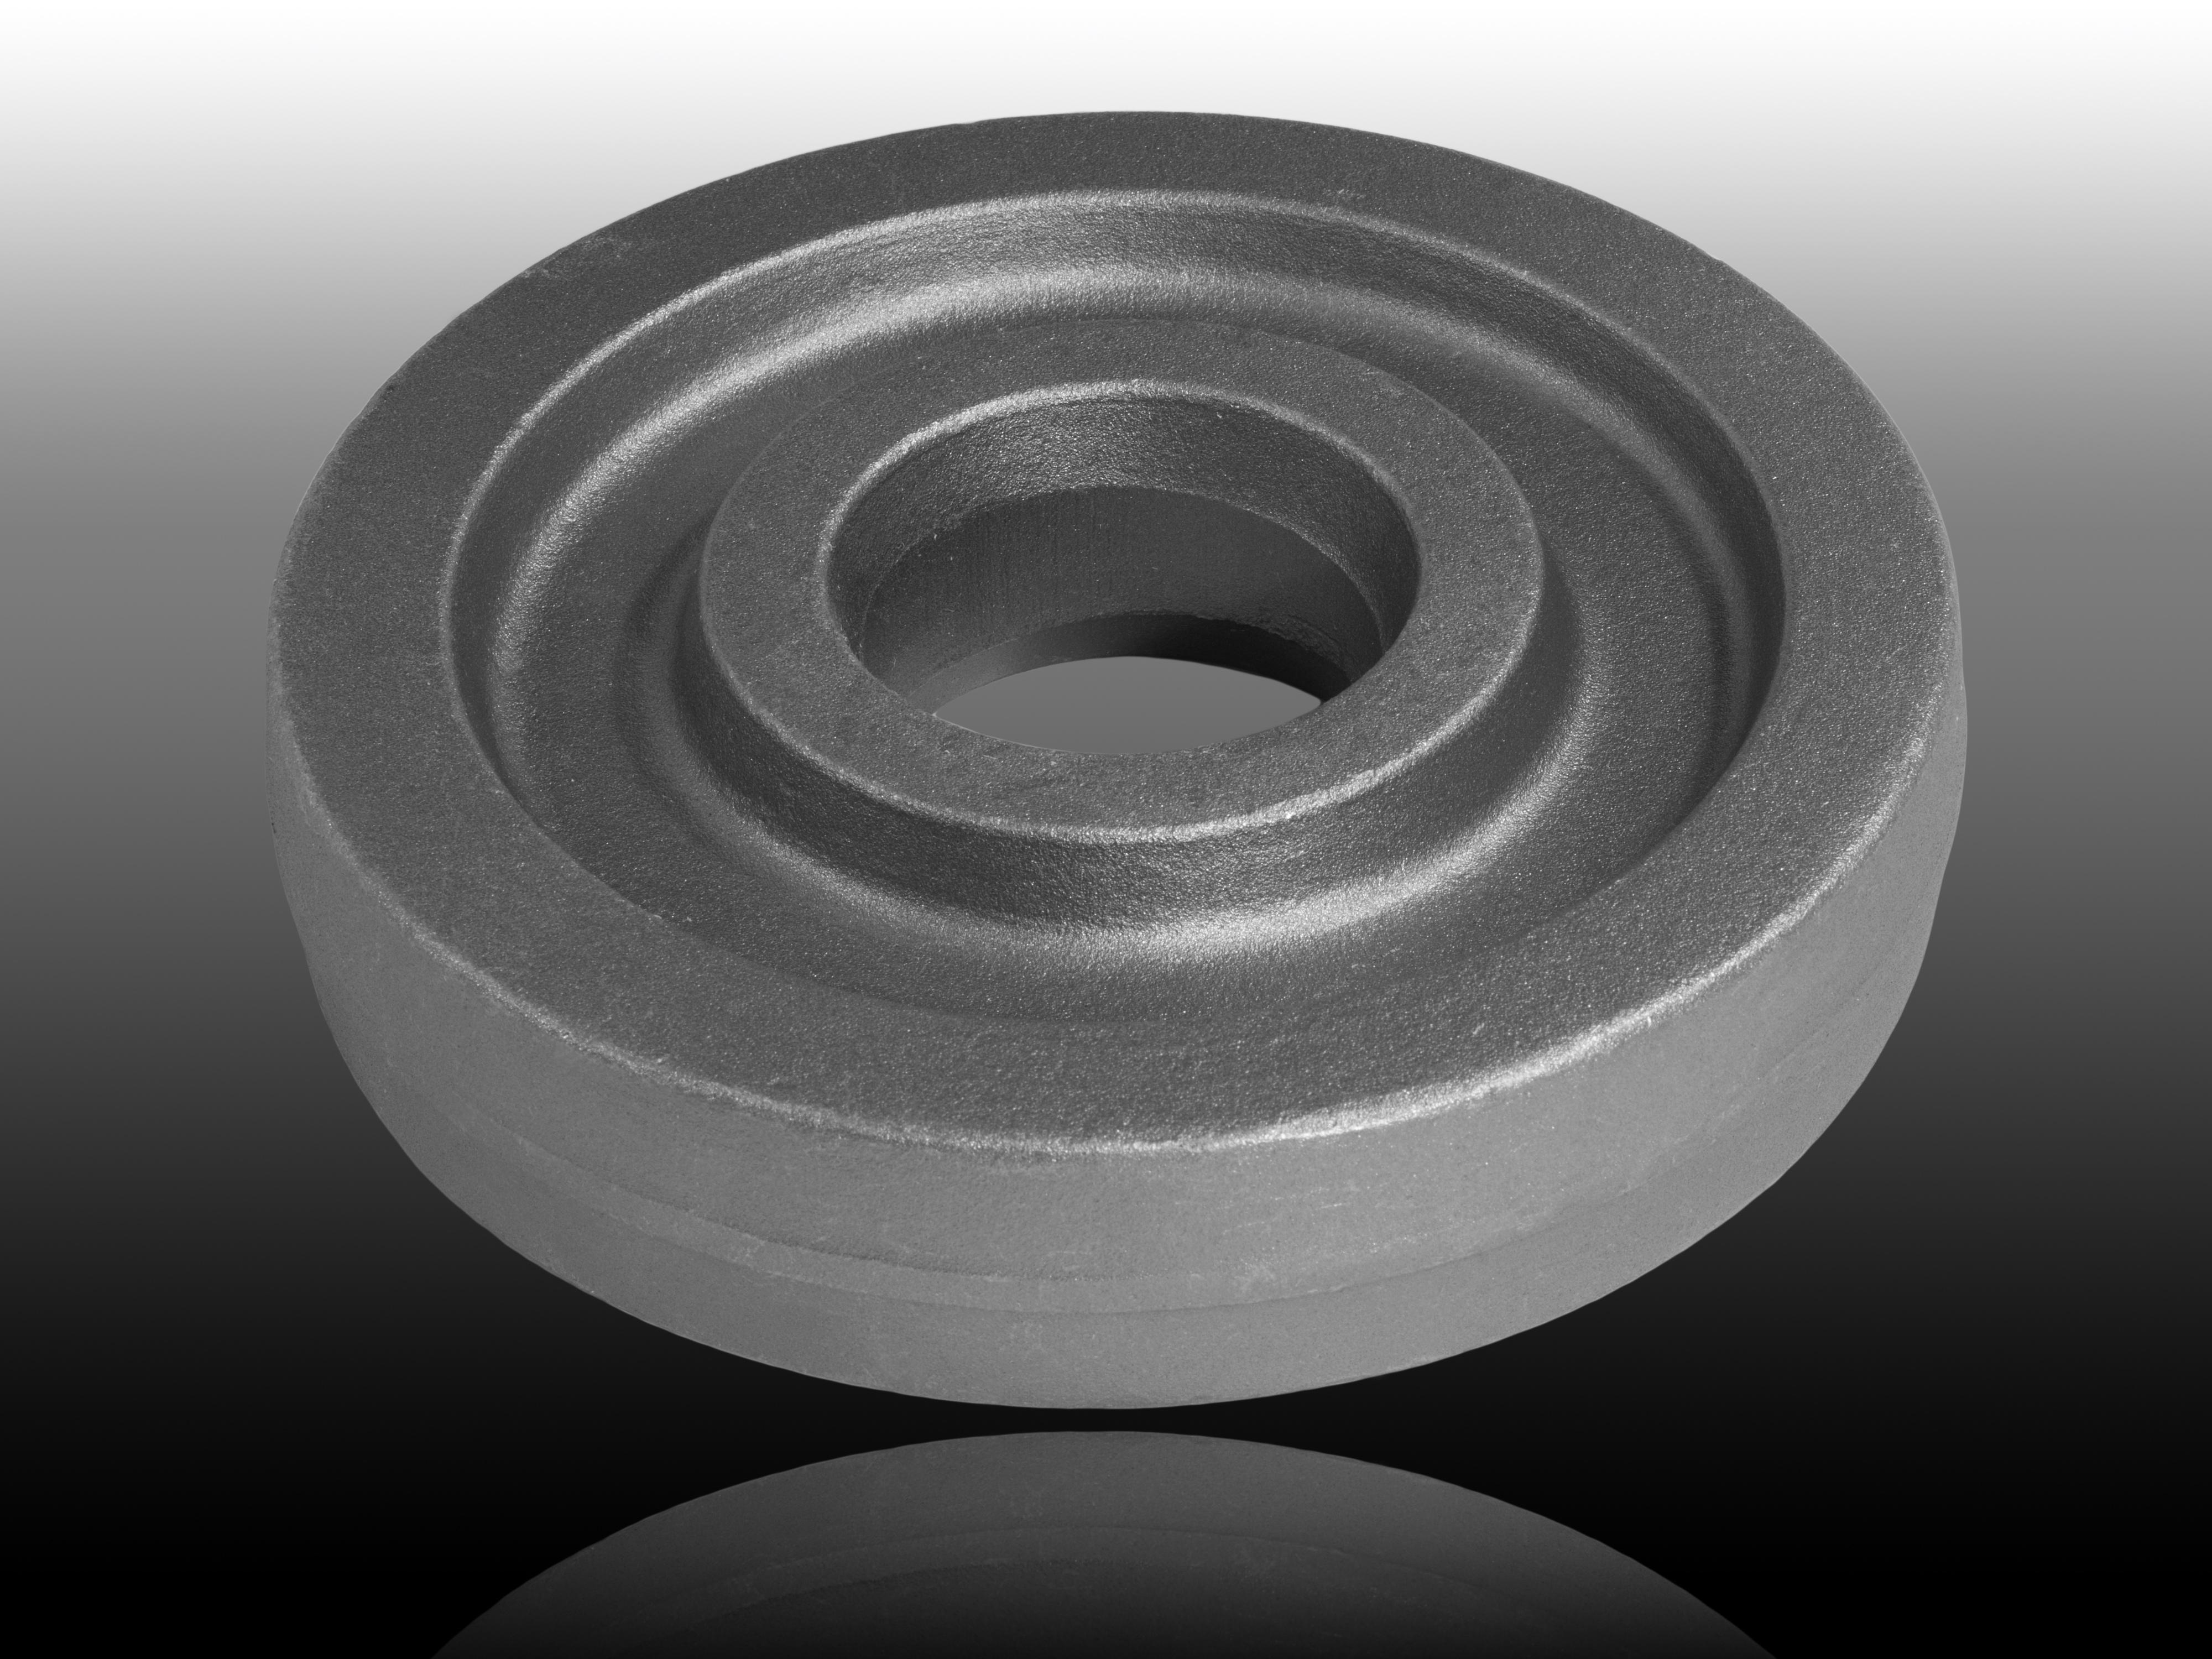 Ozubene koleso_Gear wheel_Zahnrad